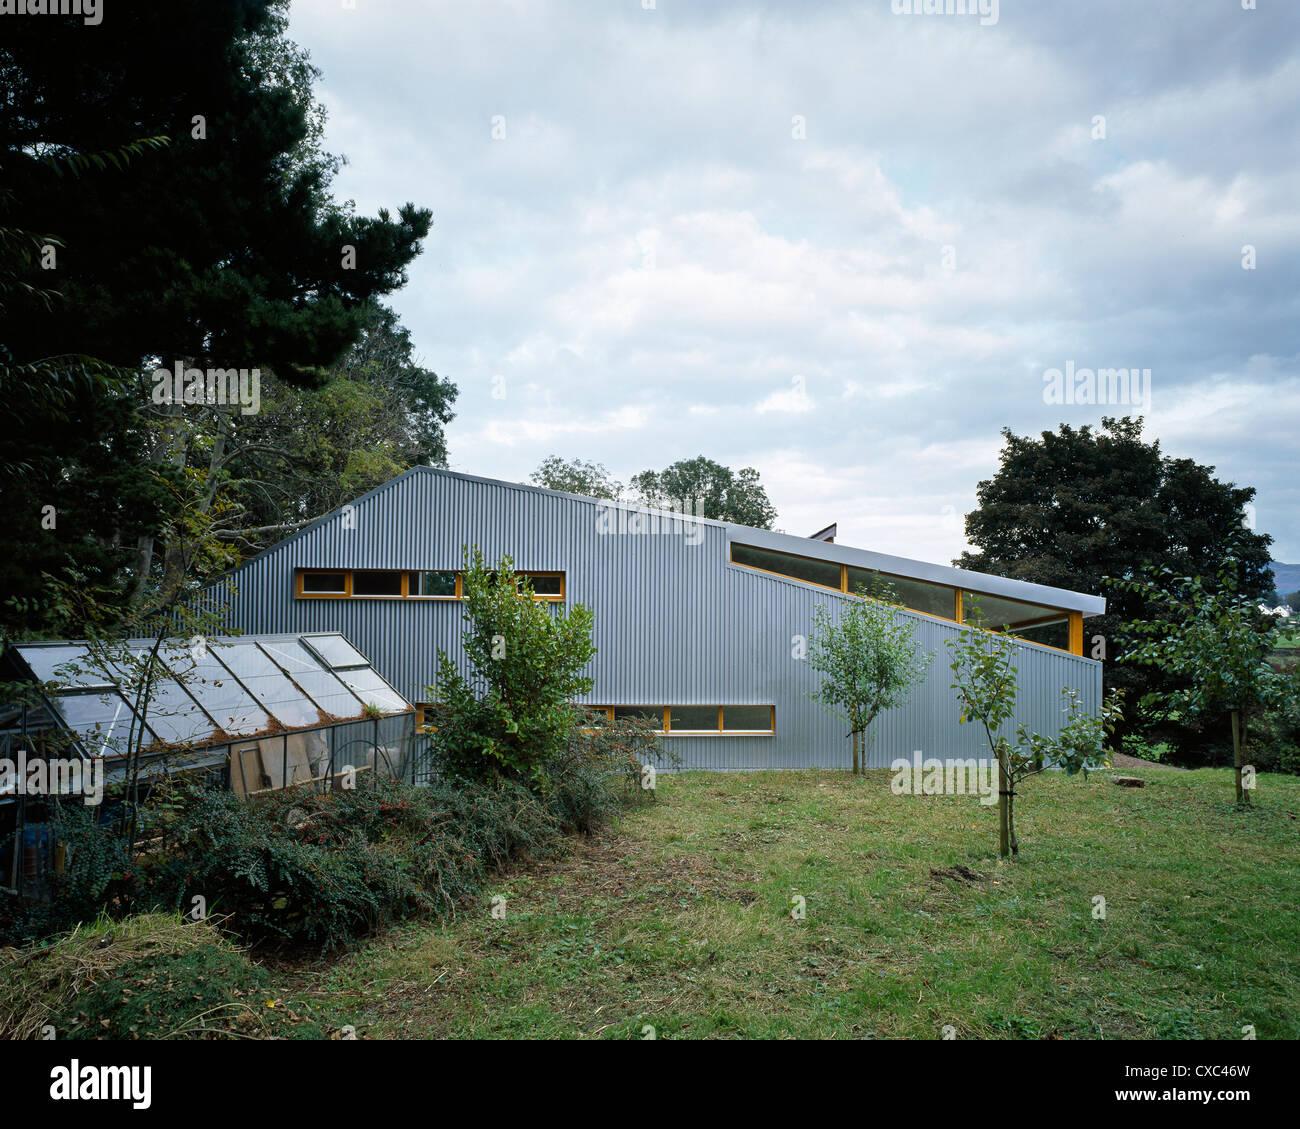 carton levert rathmullan ireland architect macgabhann architects